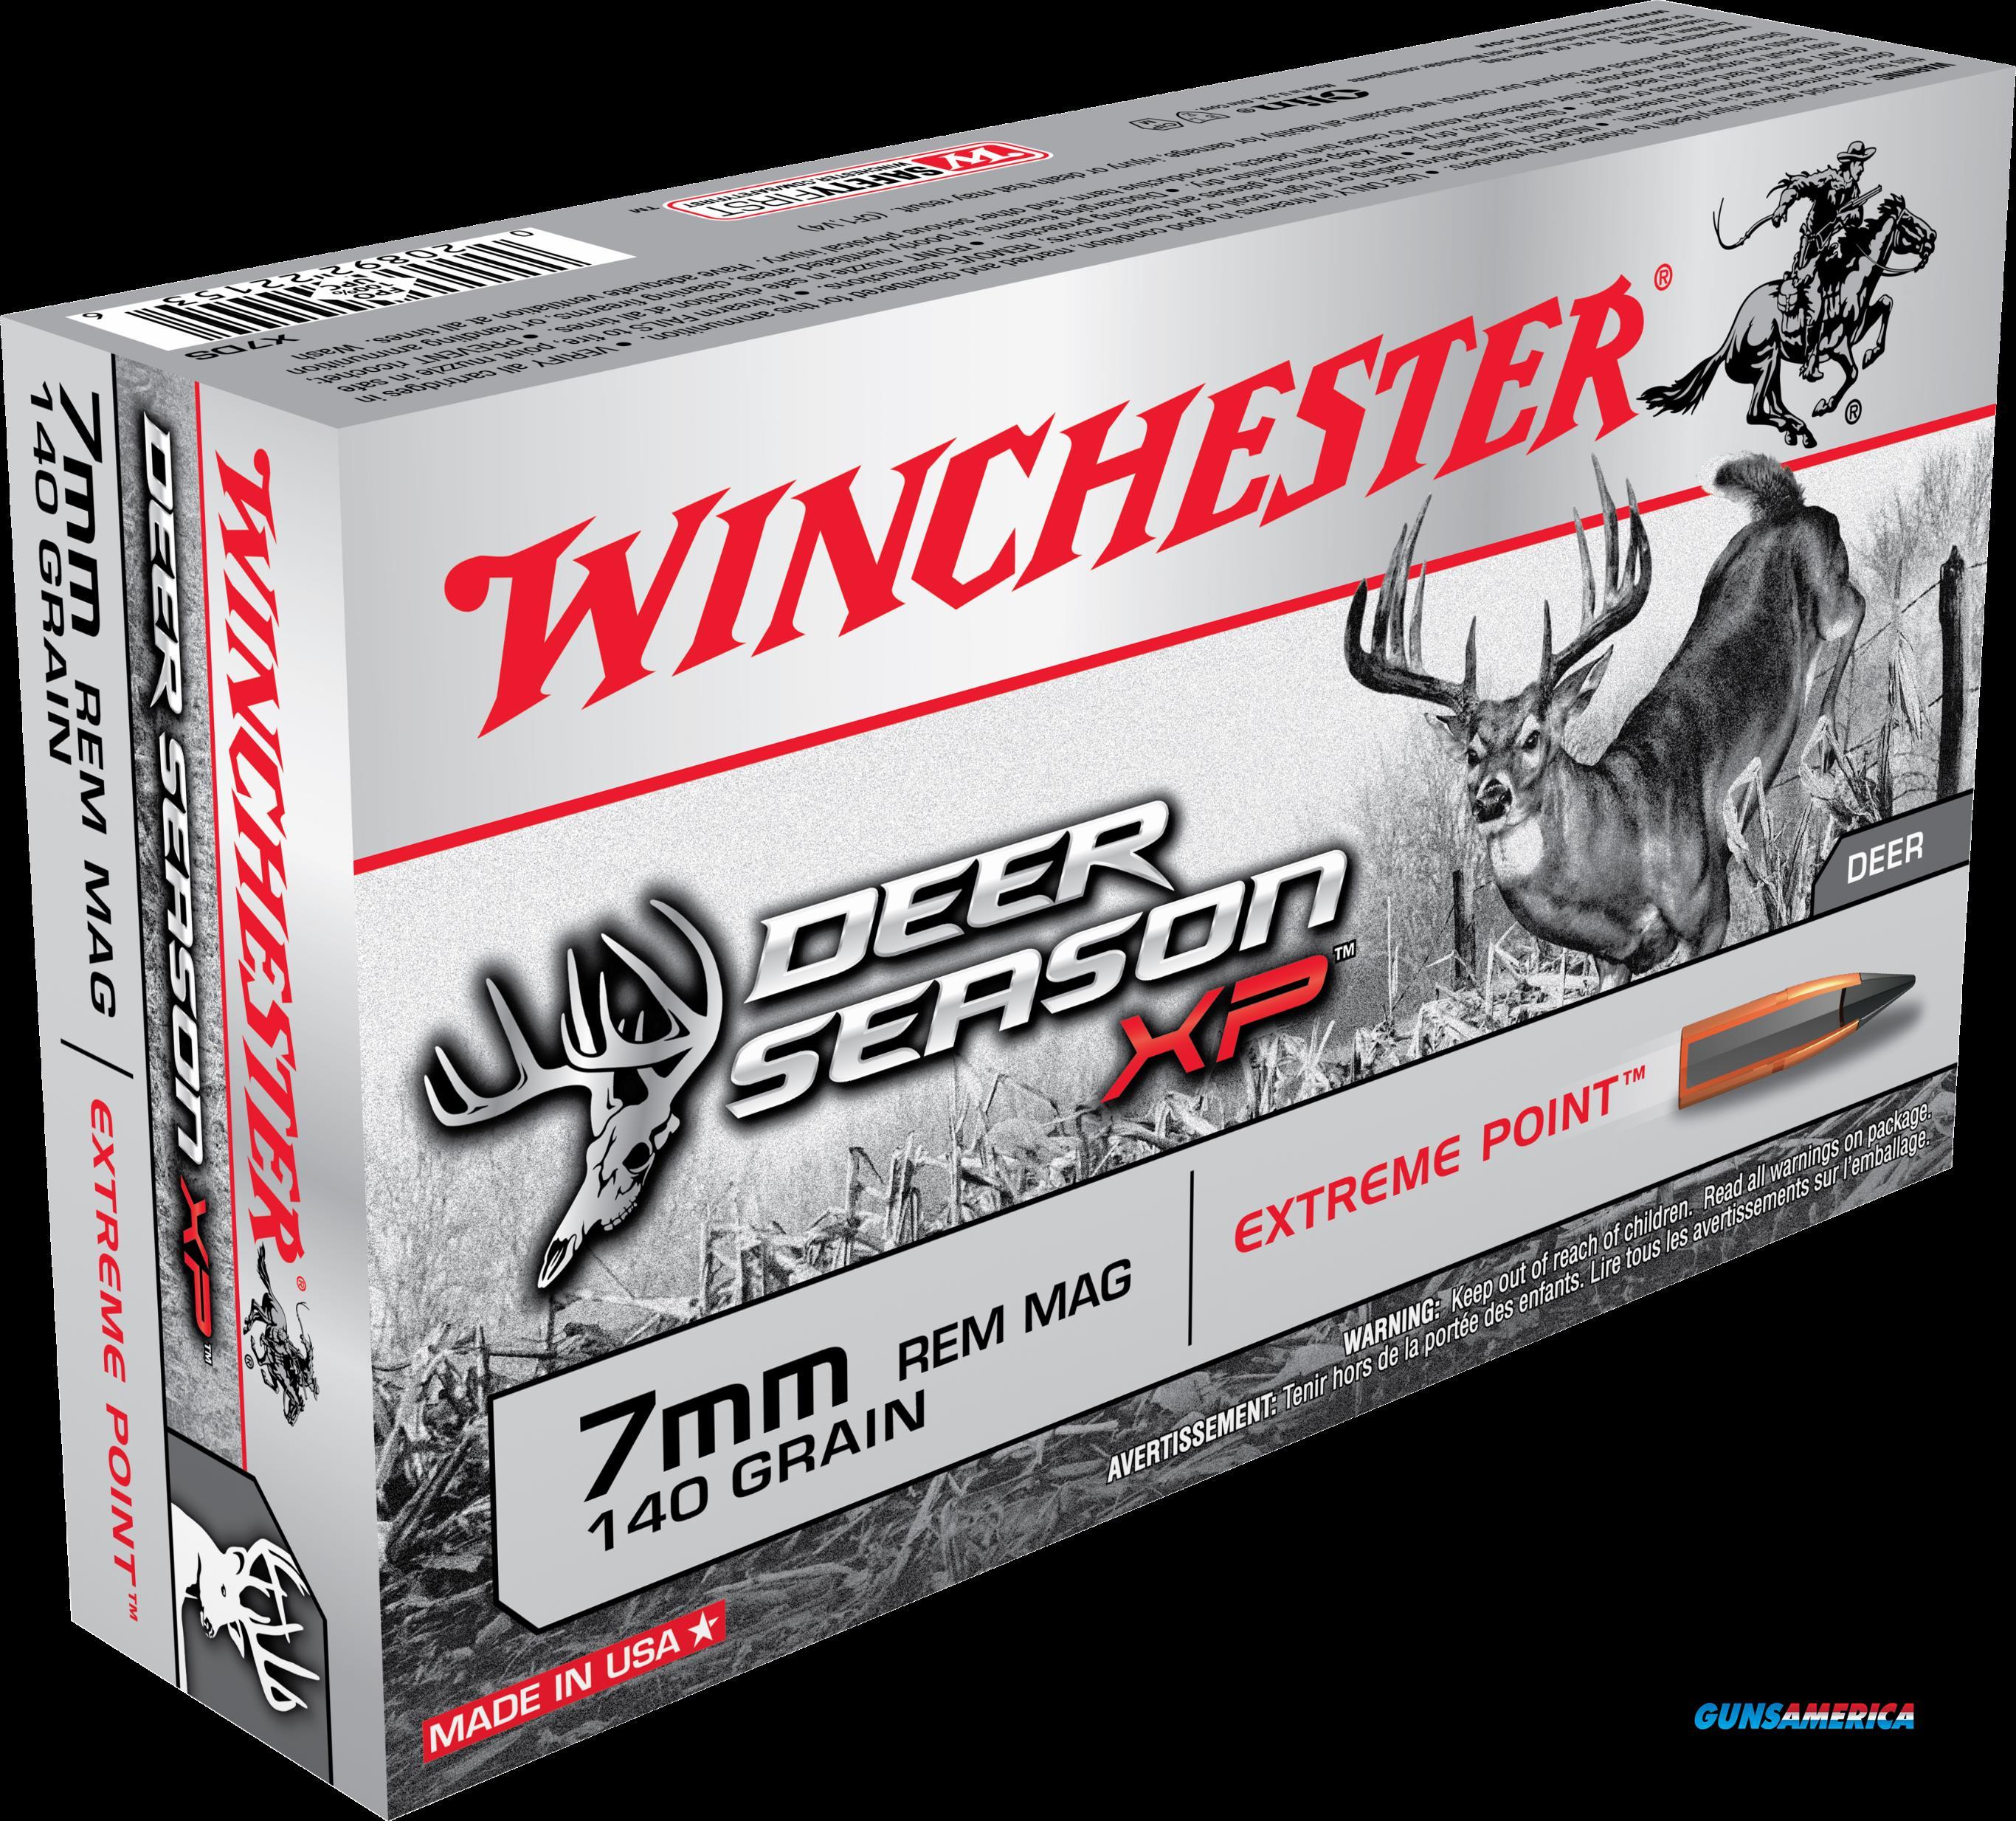 Winchester Ammo Deer Season Xp, Win X7ds    Deer  7mm    140ep   20-10  Guns > Pistols > 1911 Pistol Copies (non-Colt)